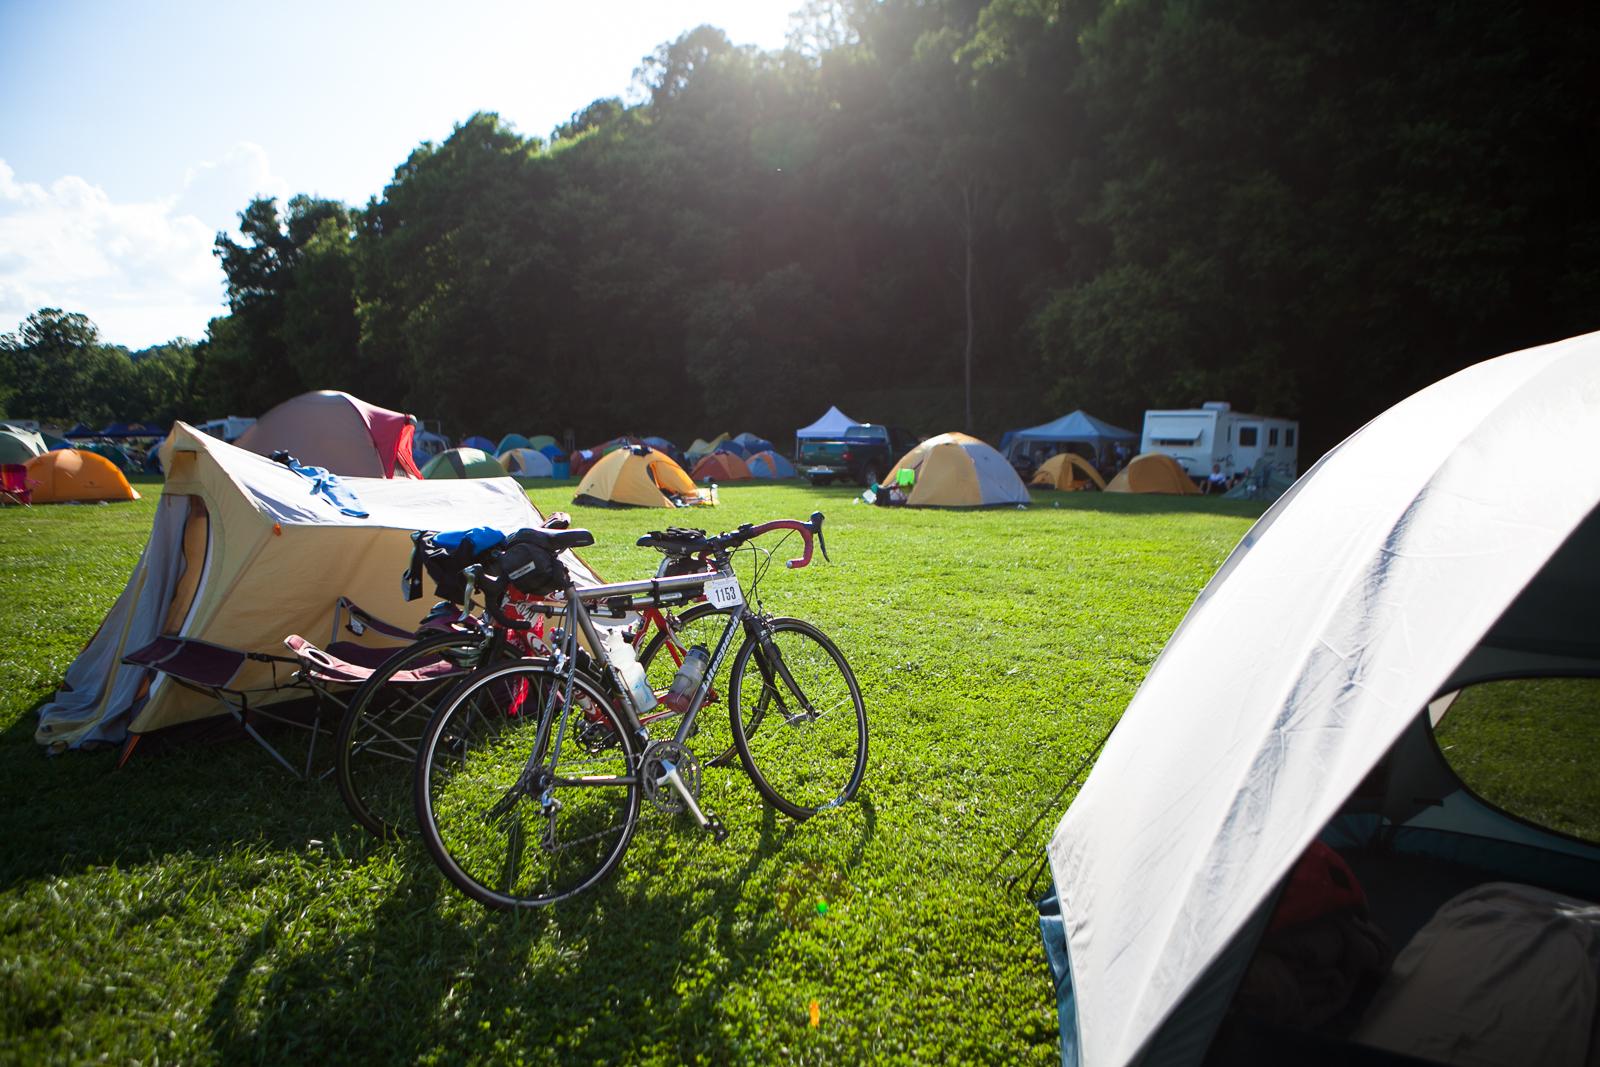 tent camping at bike virginia event